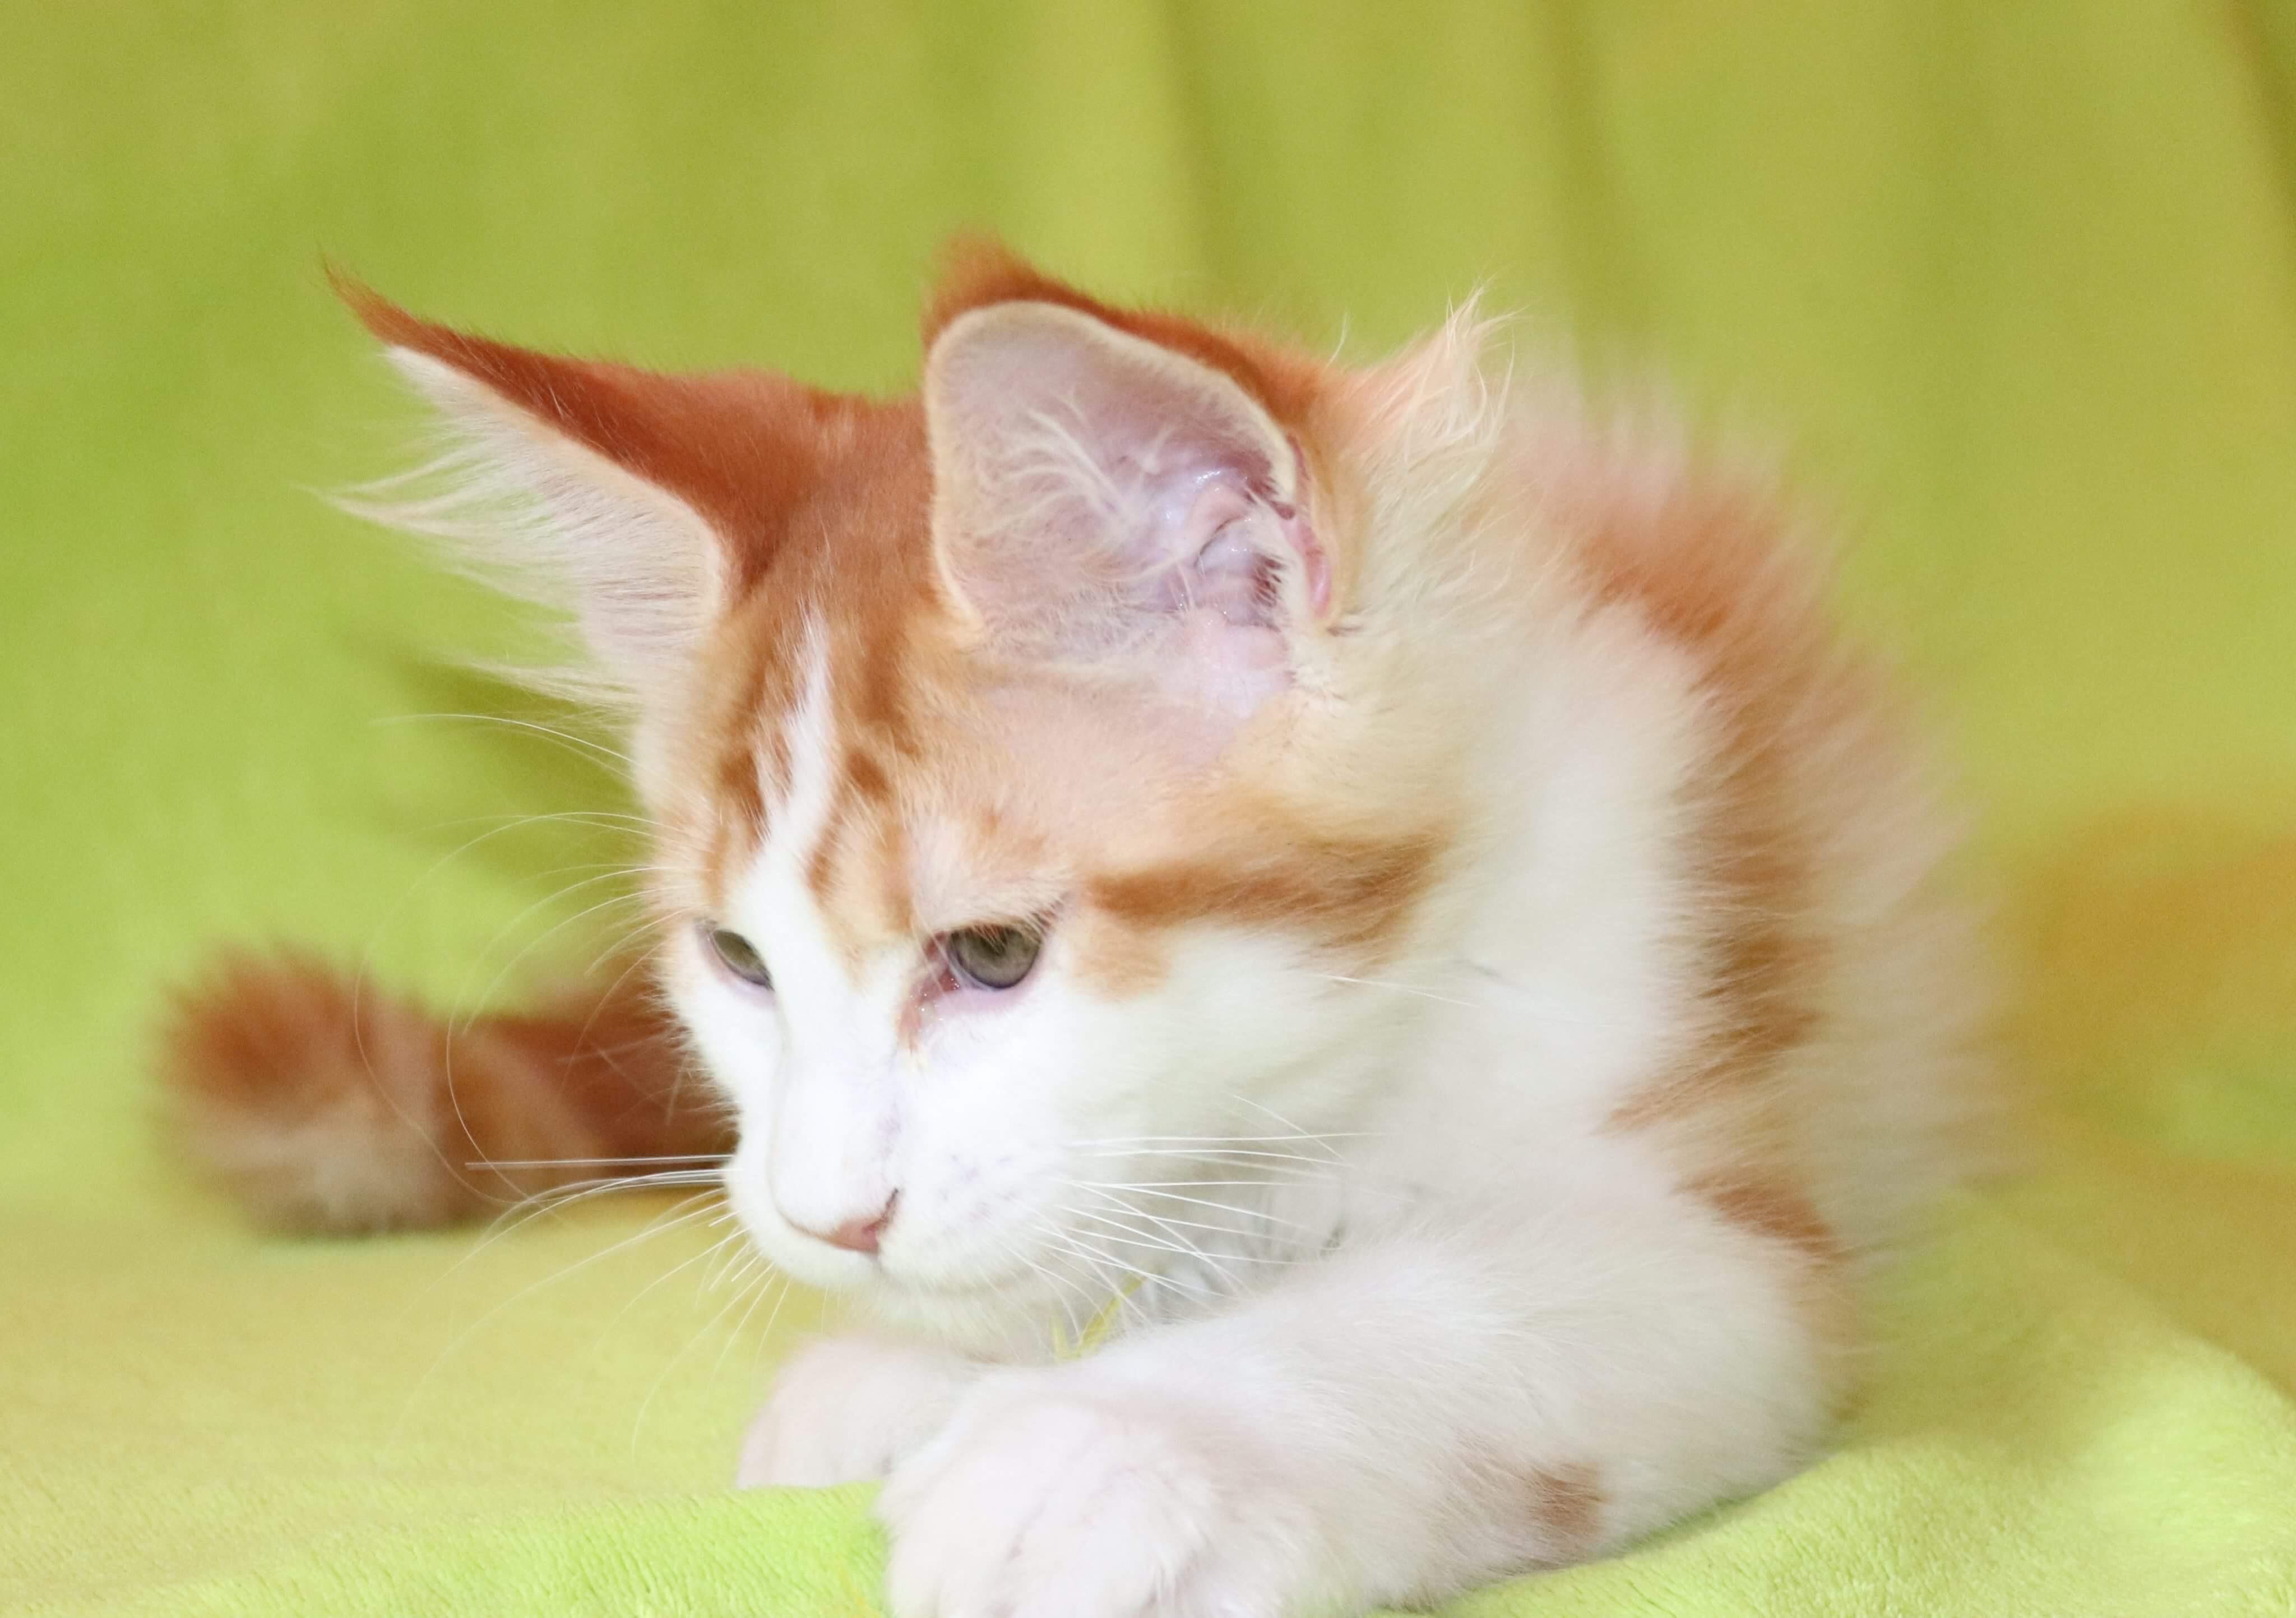 kočka VRH F: FALCO von ERILLIAN*CZ 👦🏻